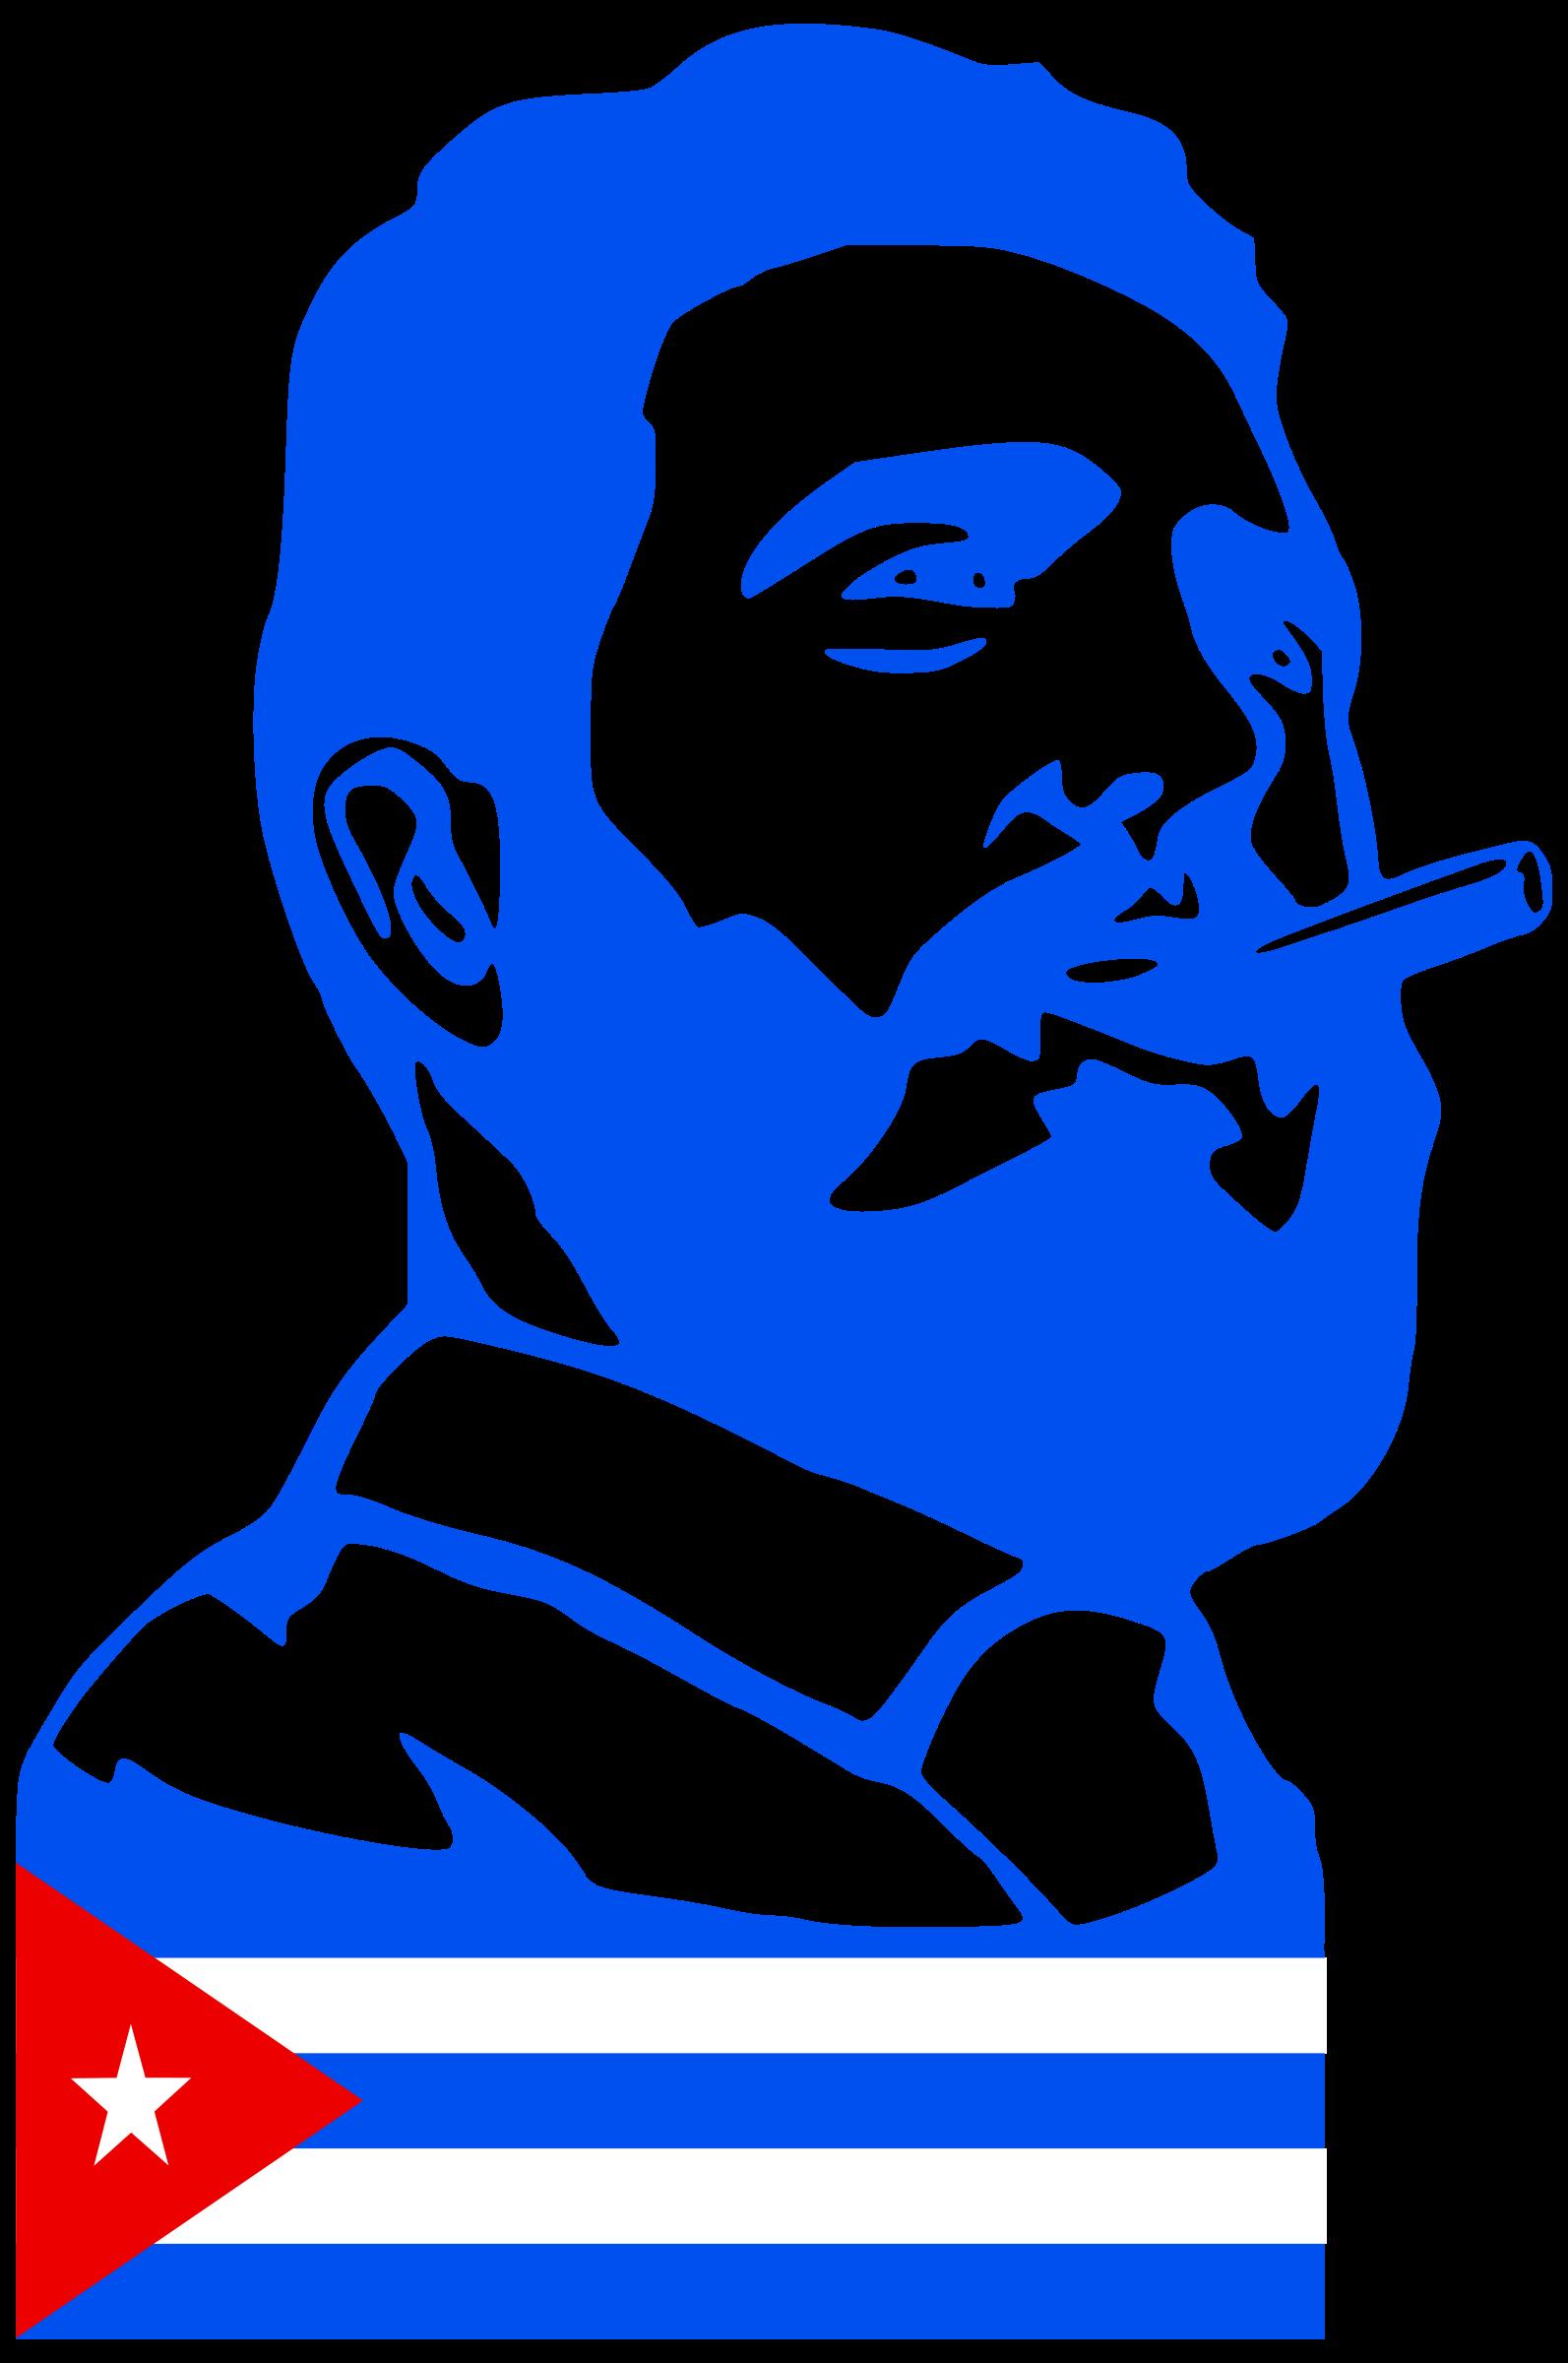 Cuba clipart #4, Download drawings